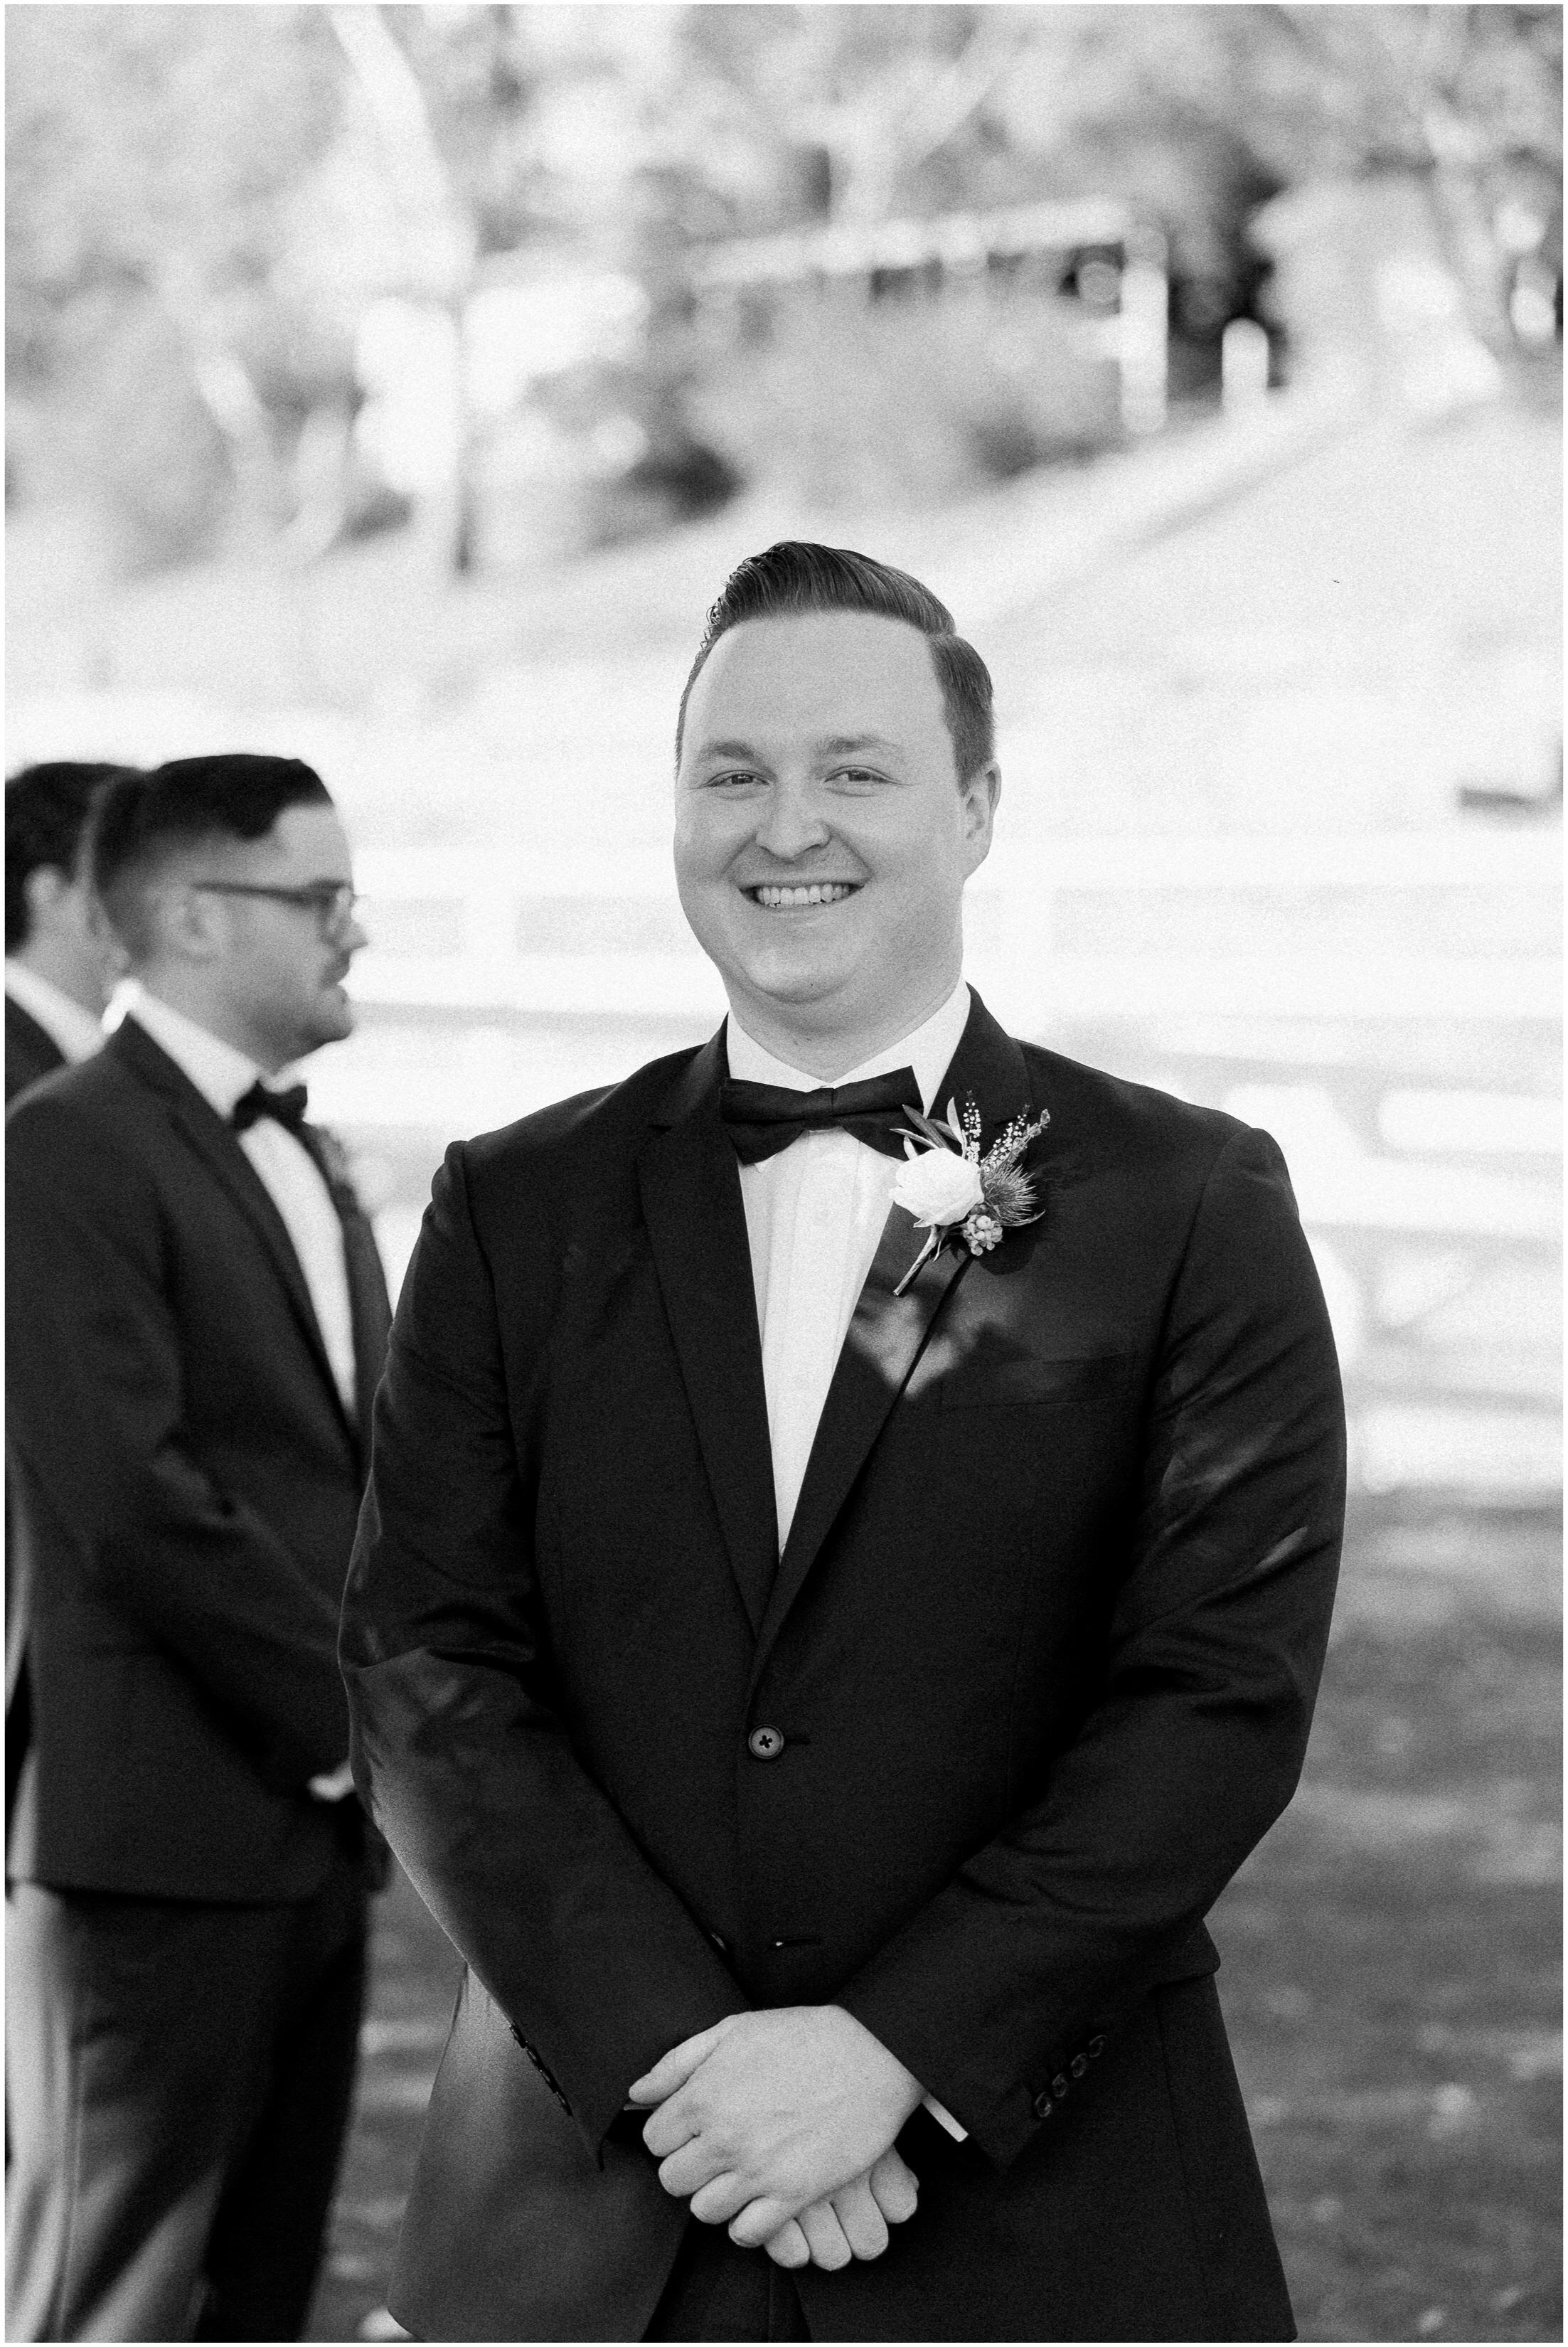 brisbane-fine-art-wedding-photographer-lauren-olivia-luxury-wedding-australia-04.jpg